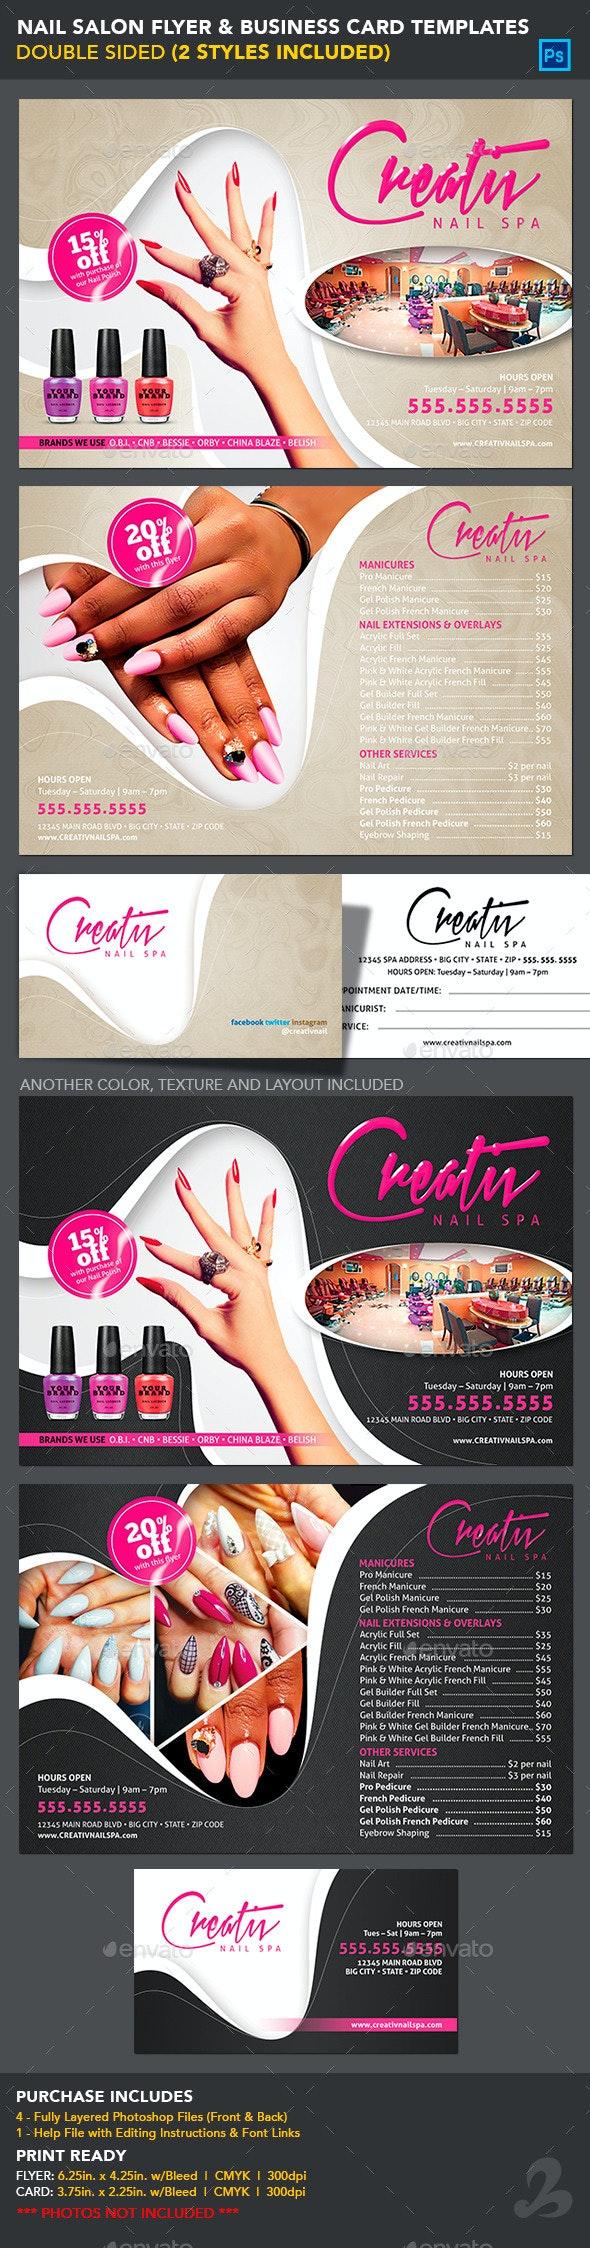 Nail Salon Flyer & Business Card Templates - Commerce Flyers